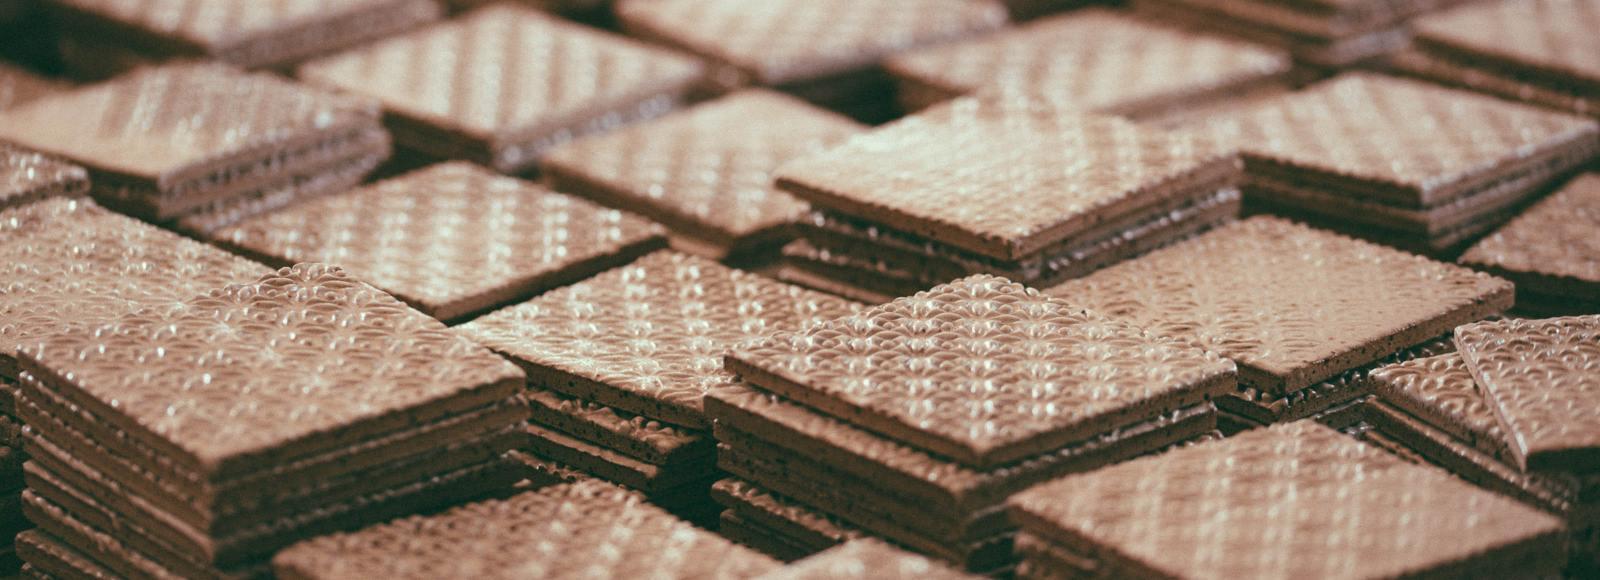 Handmade Ceramic Tiles | deVOL Kitchens